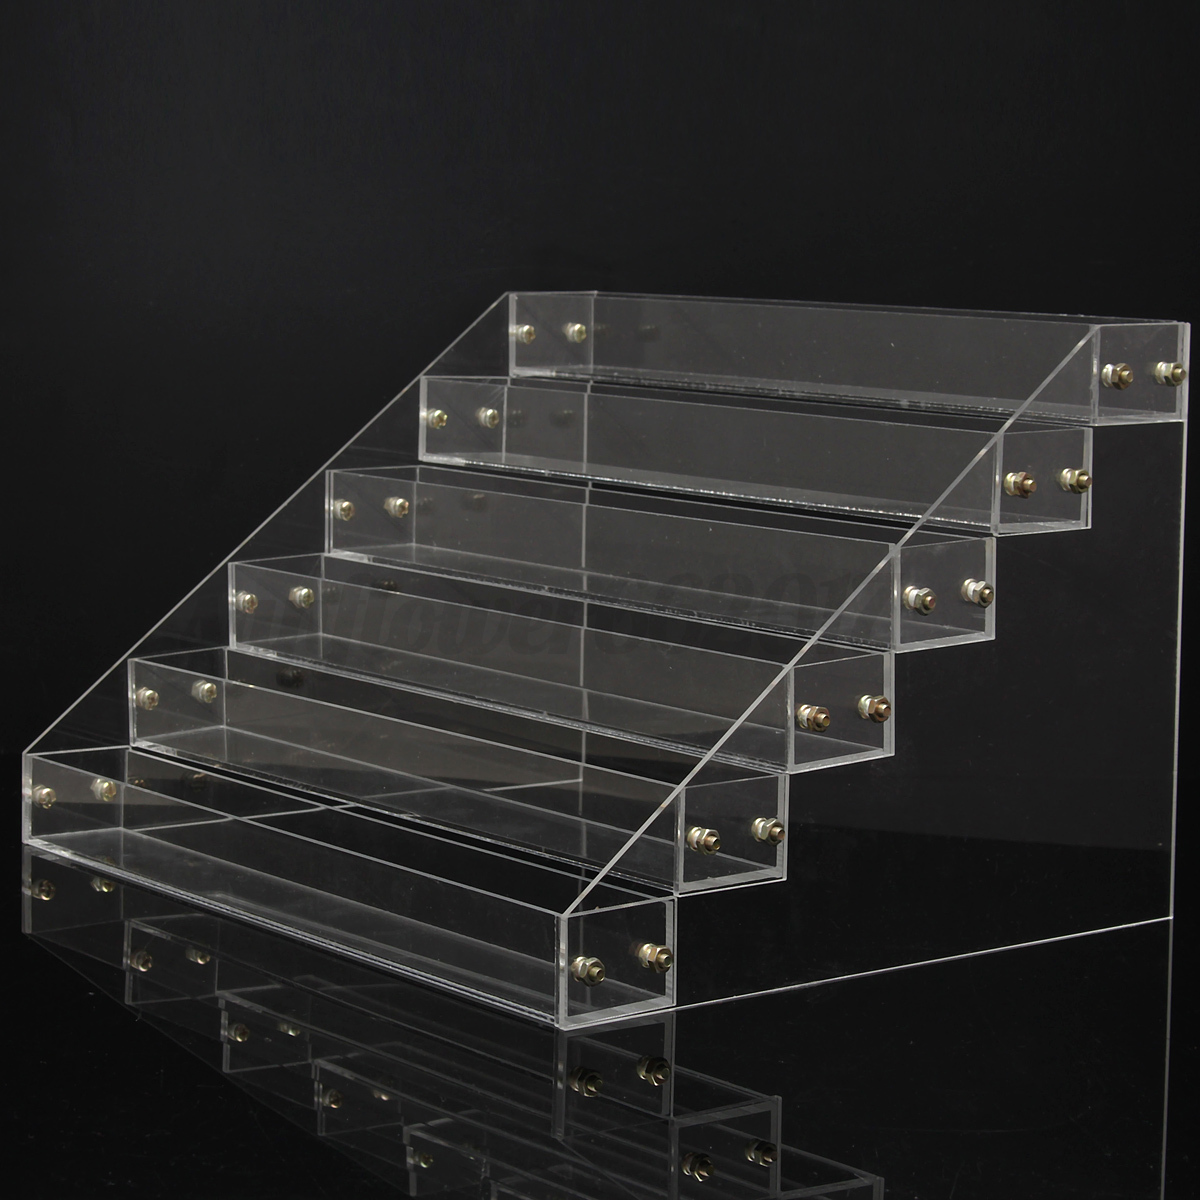 60 nagellack treppe display large circa flaschen 6 etagen for Nagellack treppe